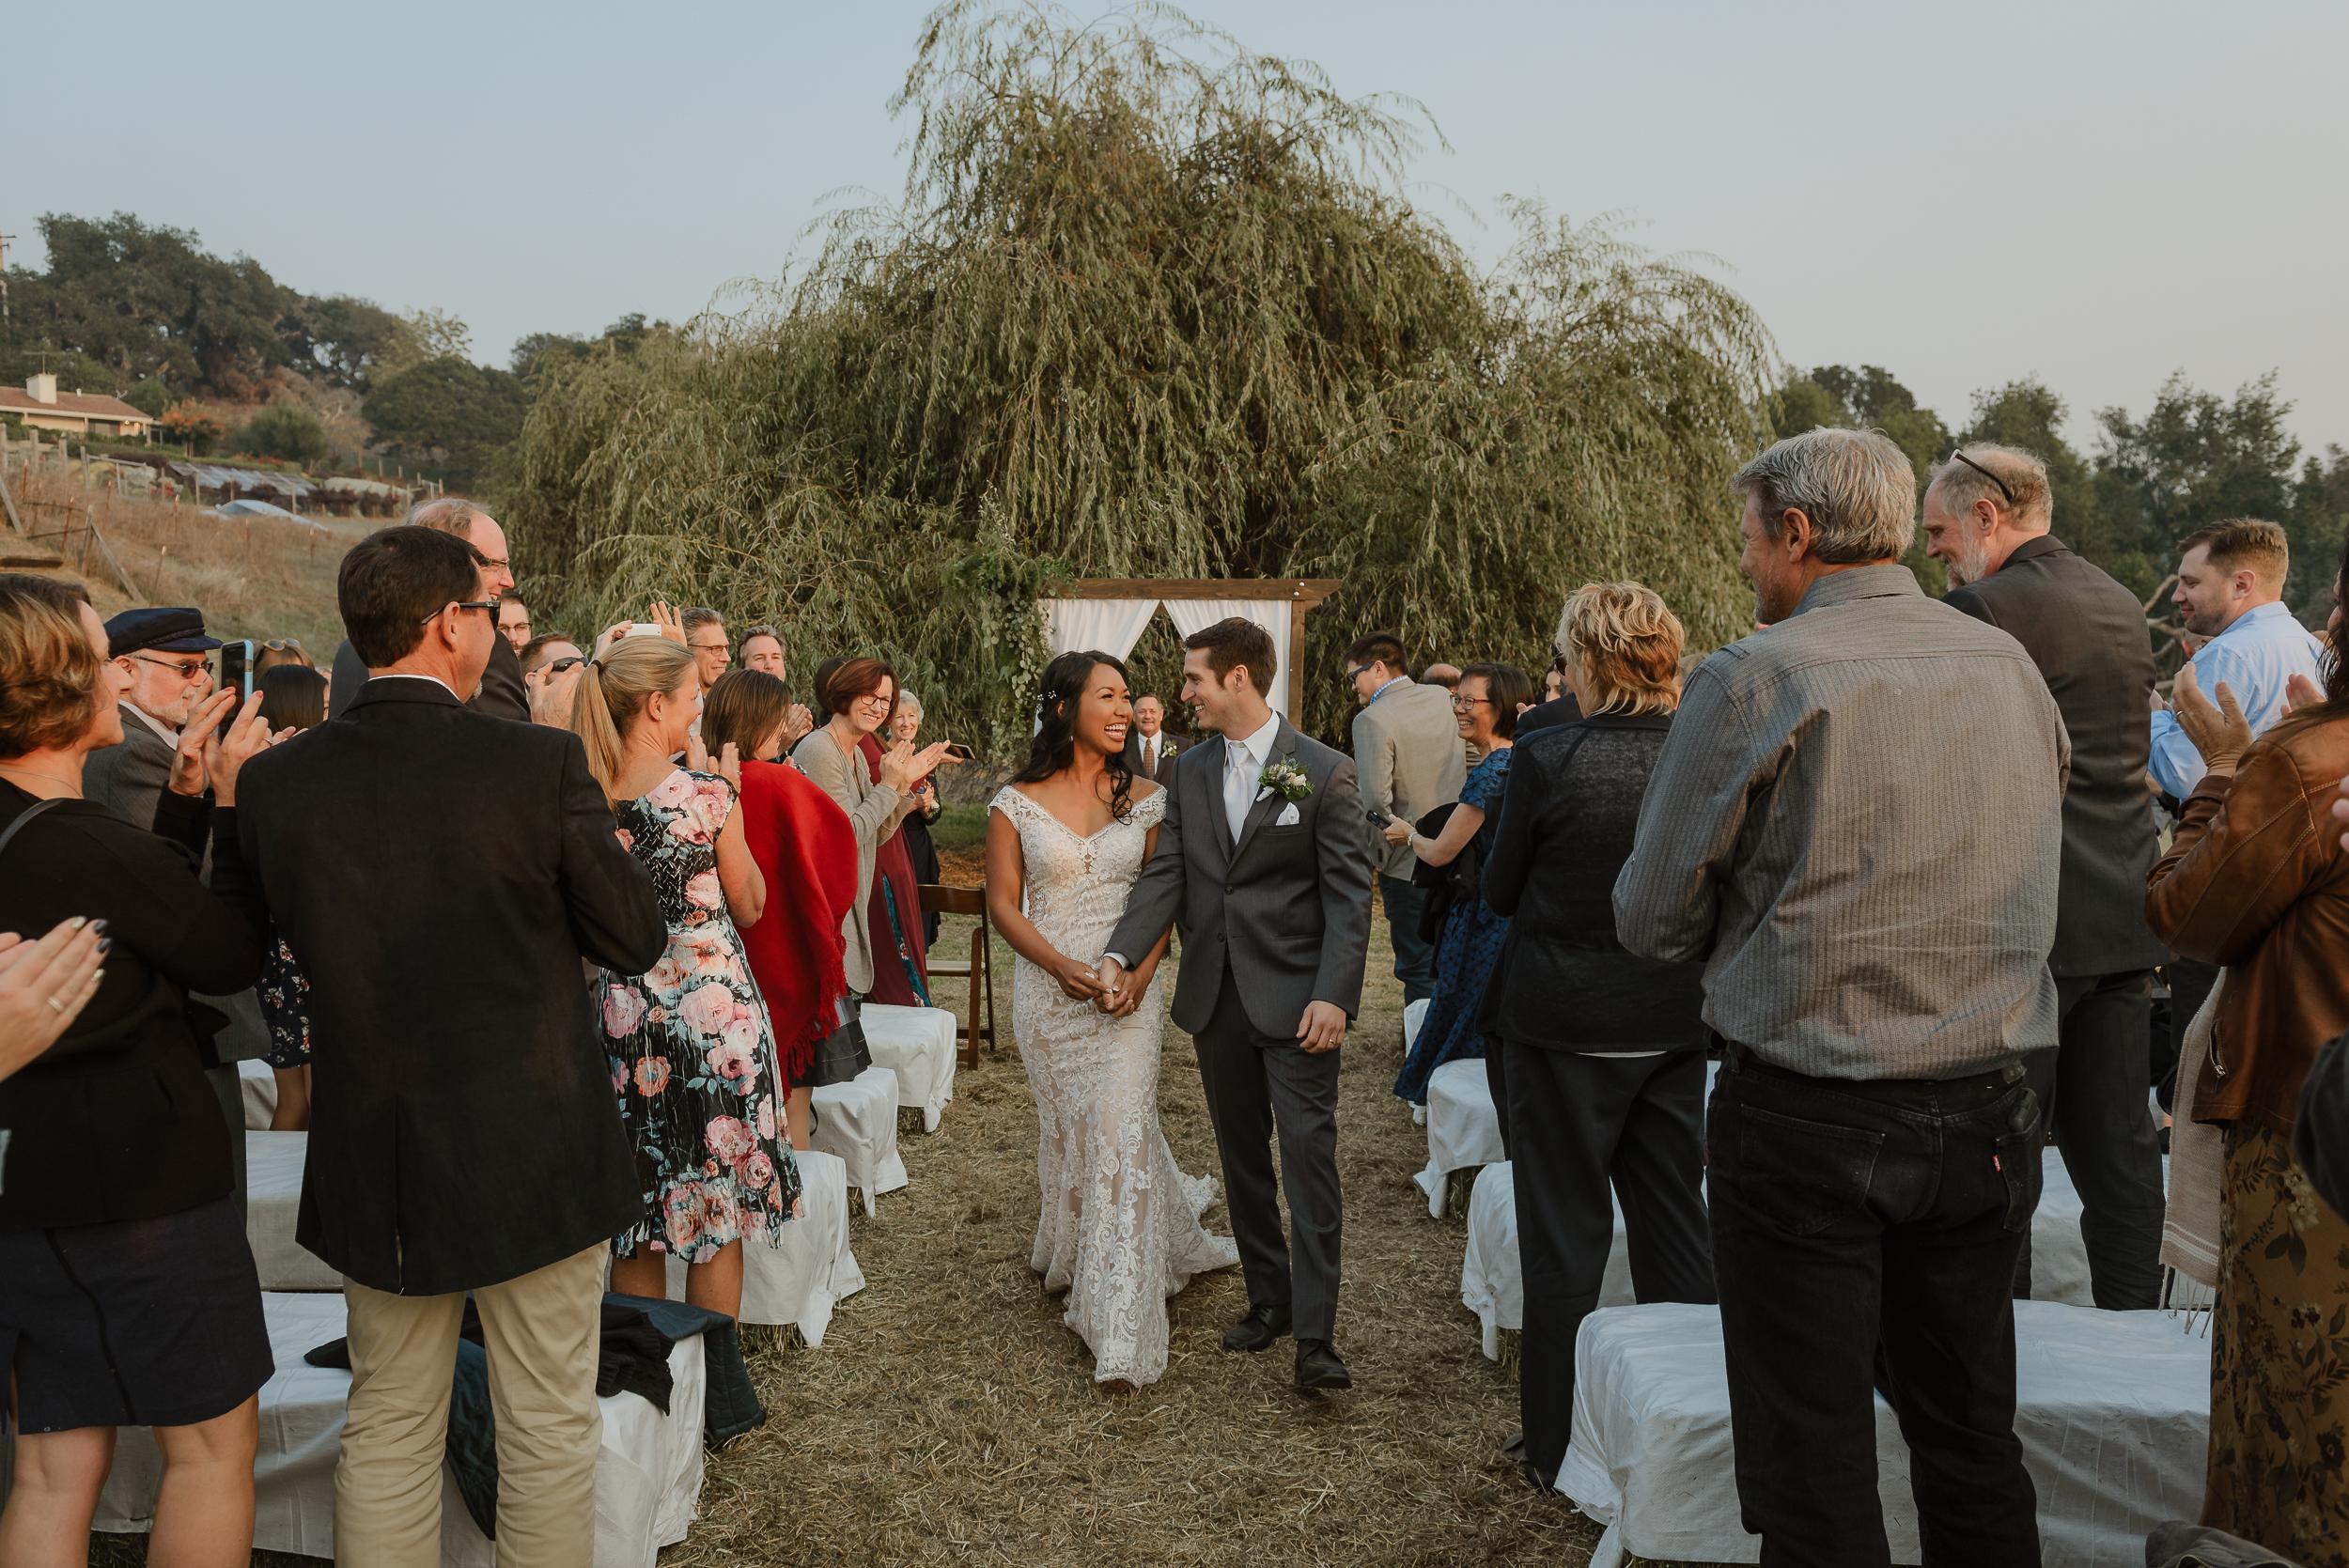 055marin-petaluma-backyard-wedding-vivianchen-352.jpg